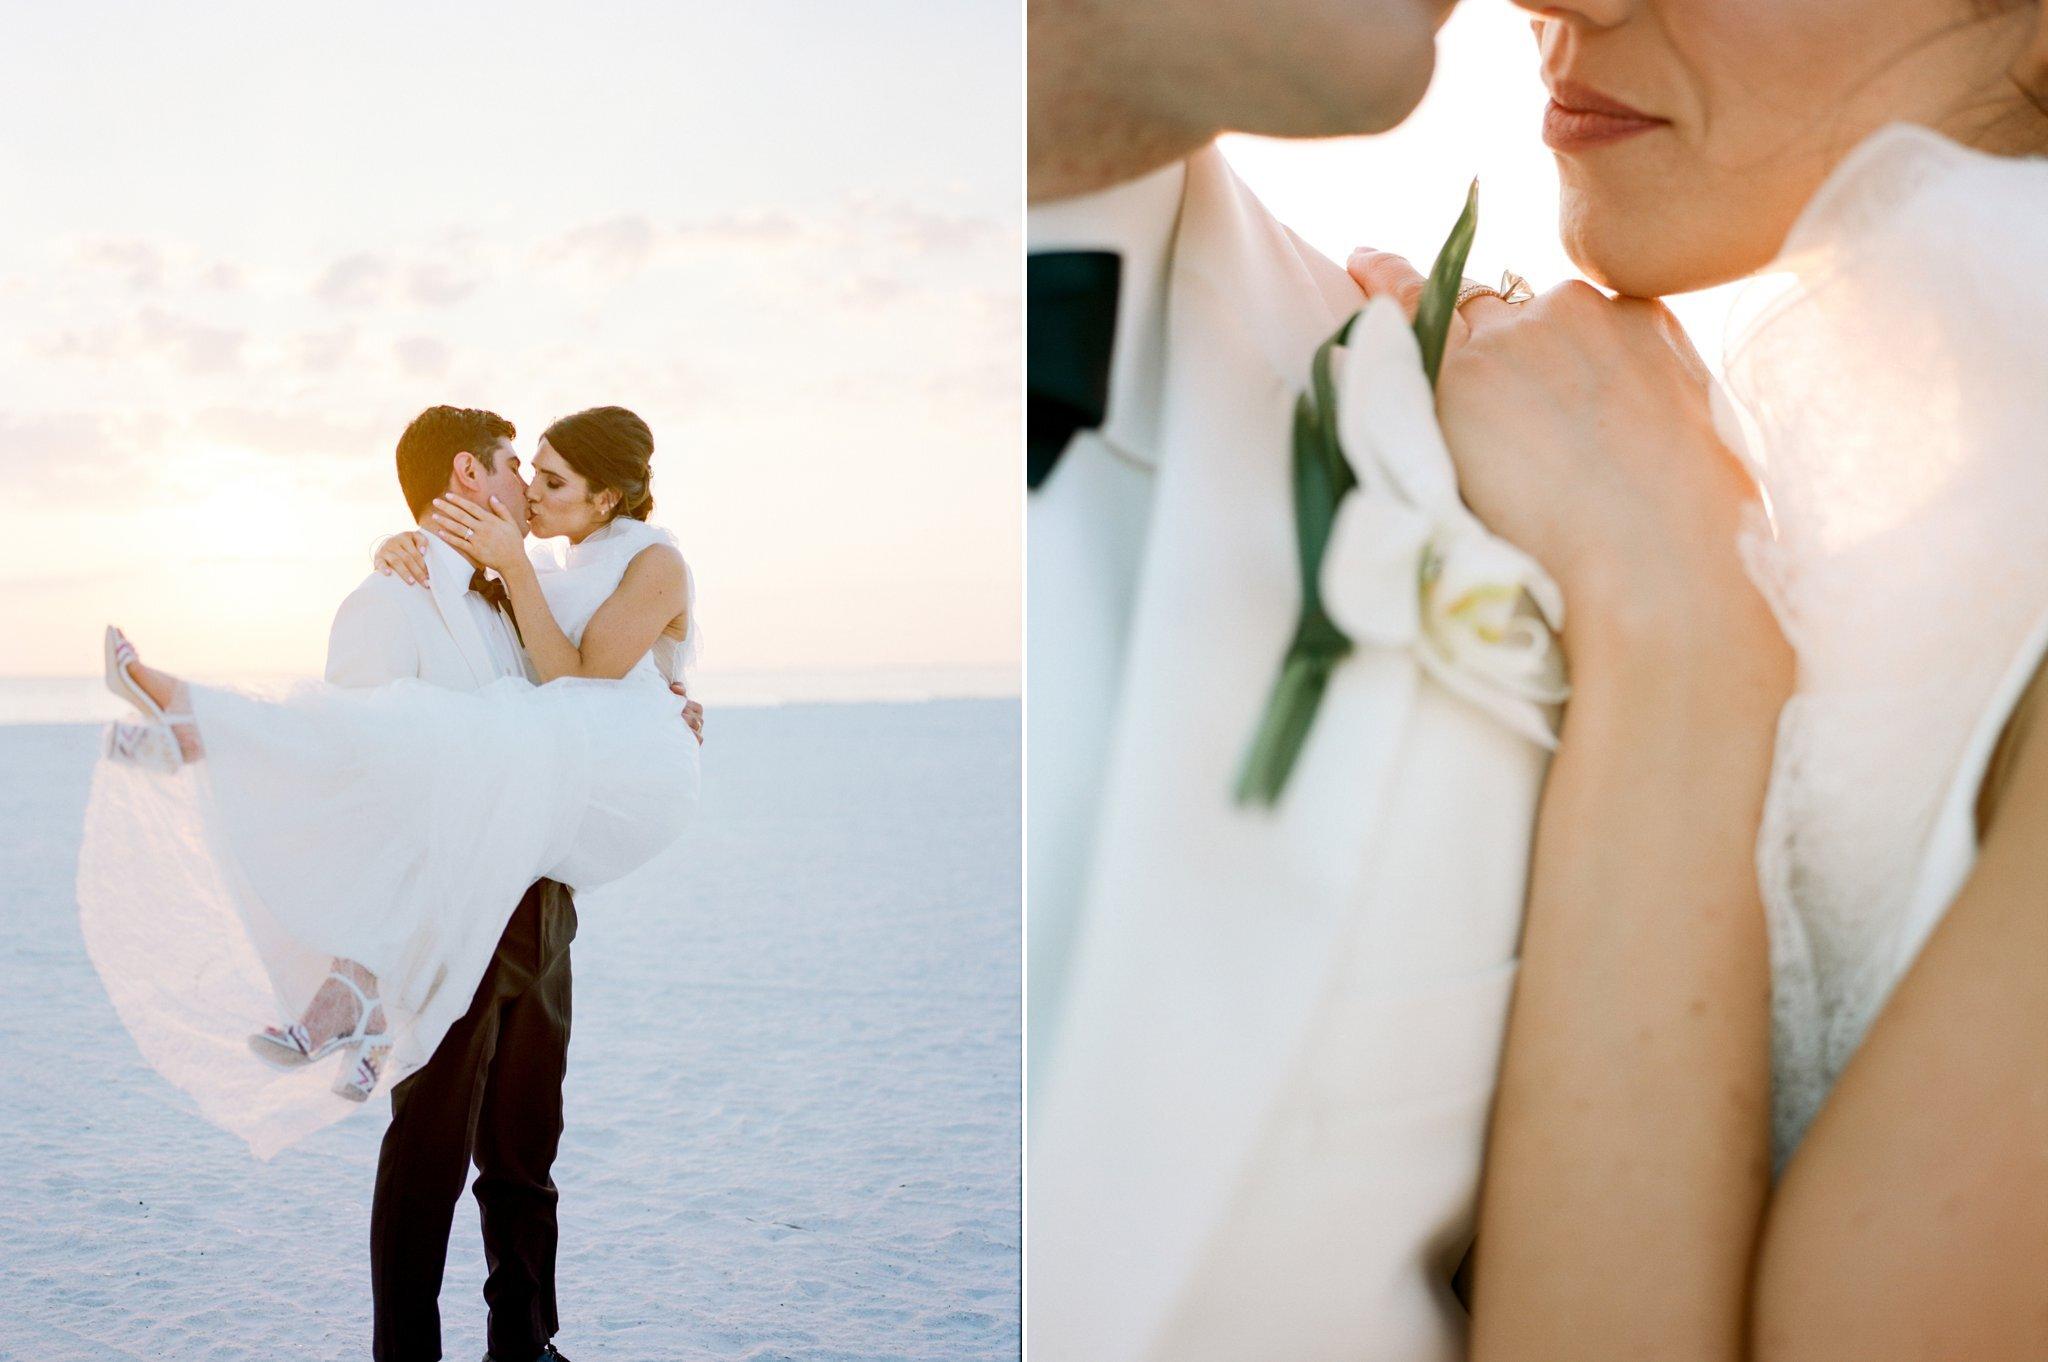 jw marriott marco island wedding photographer marco island wedding photographer shannon griffin photography_0205.jpg